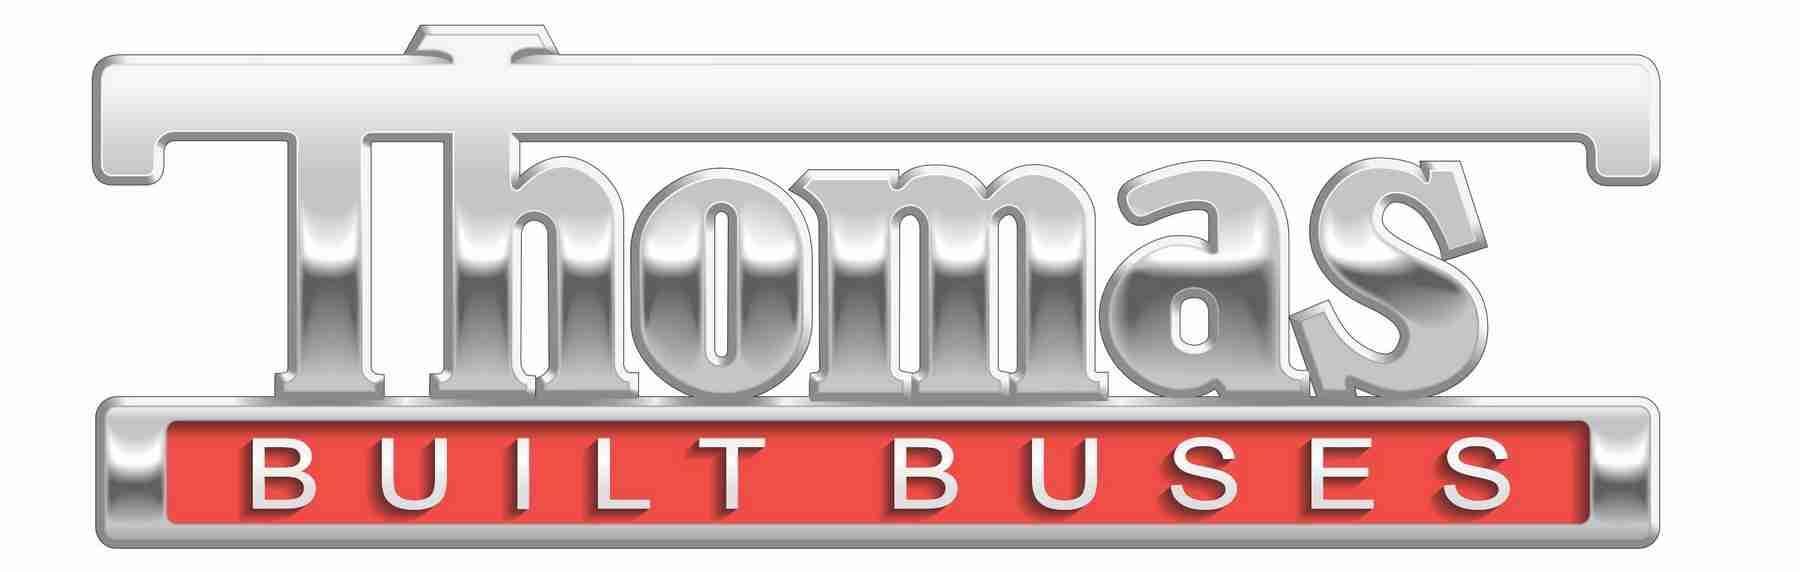 Thomas Built Buses >> Thomas Built Buses Dealers: Buy MFSAB Multi-Functional ...